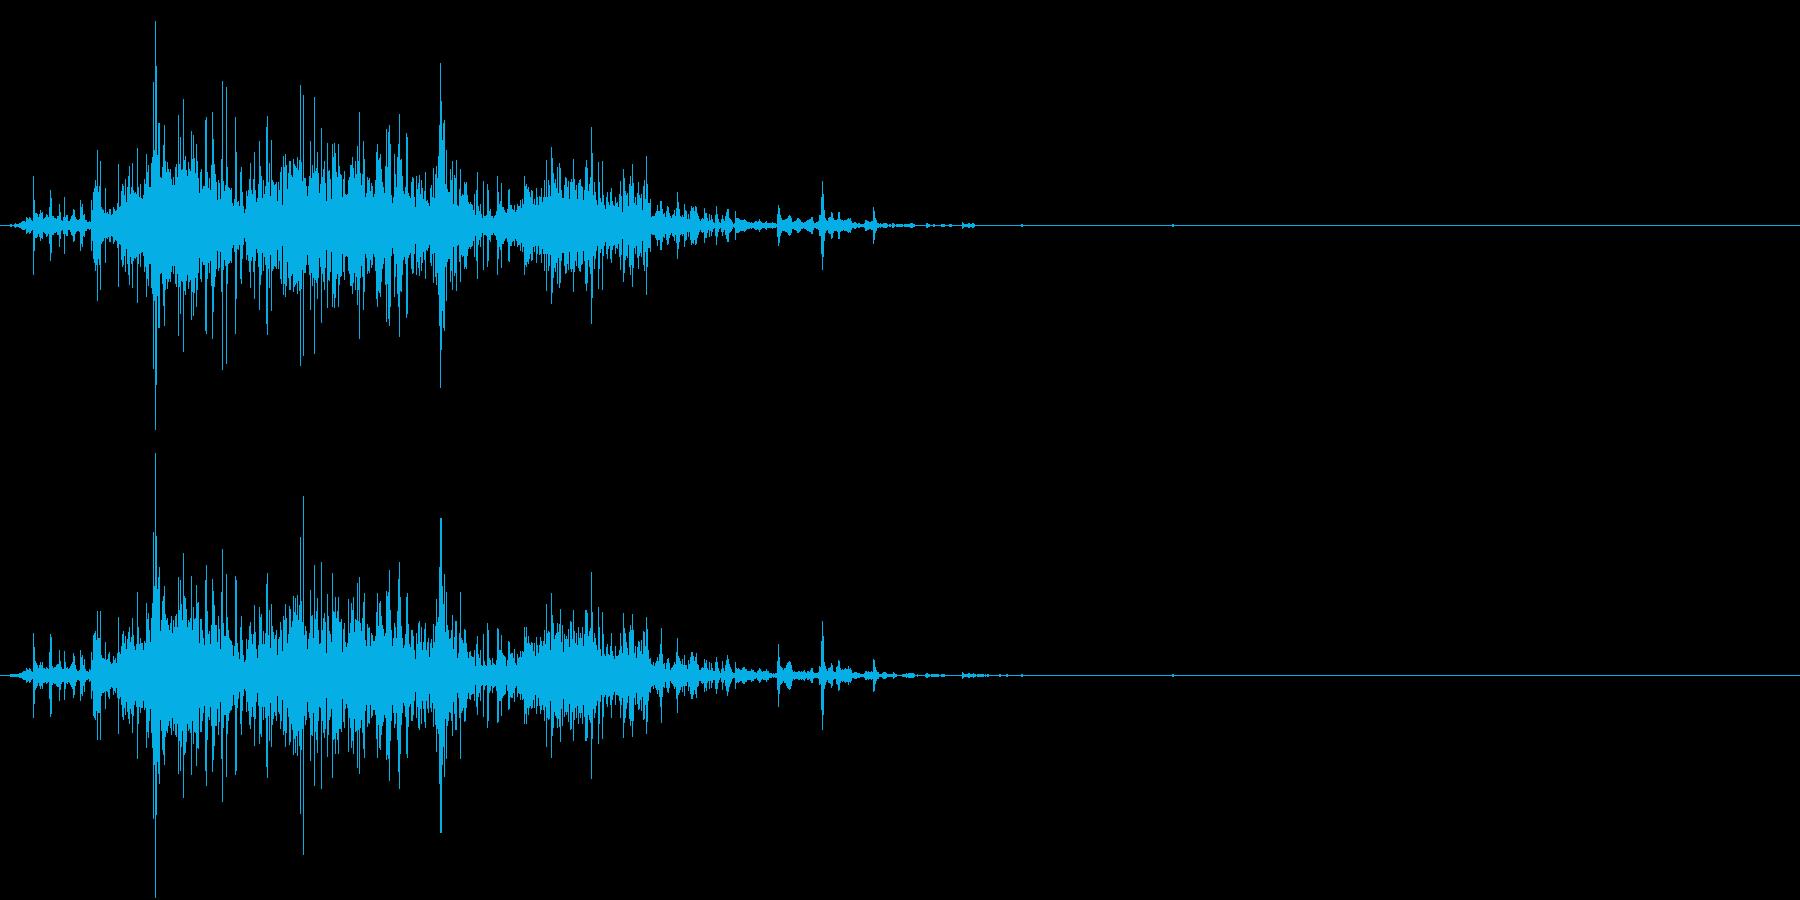 Zombie ゾンビが噛み付く音 捕食の再生済みの波形